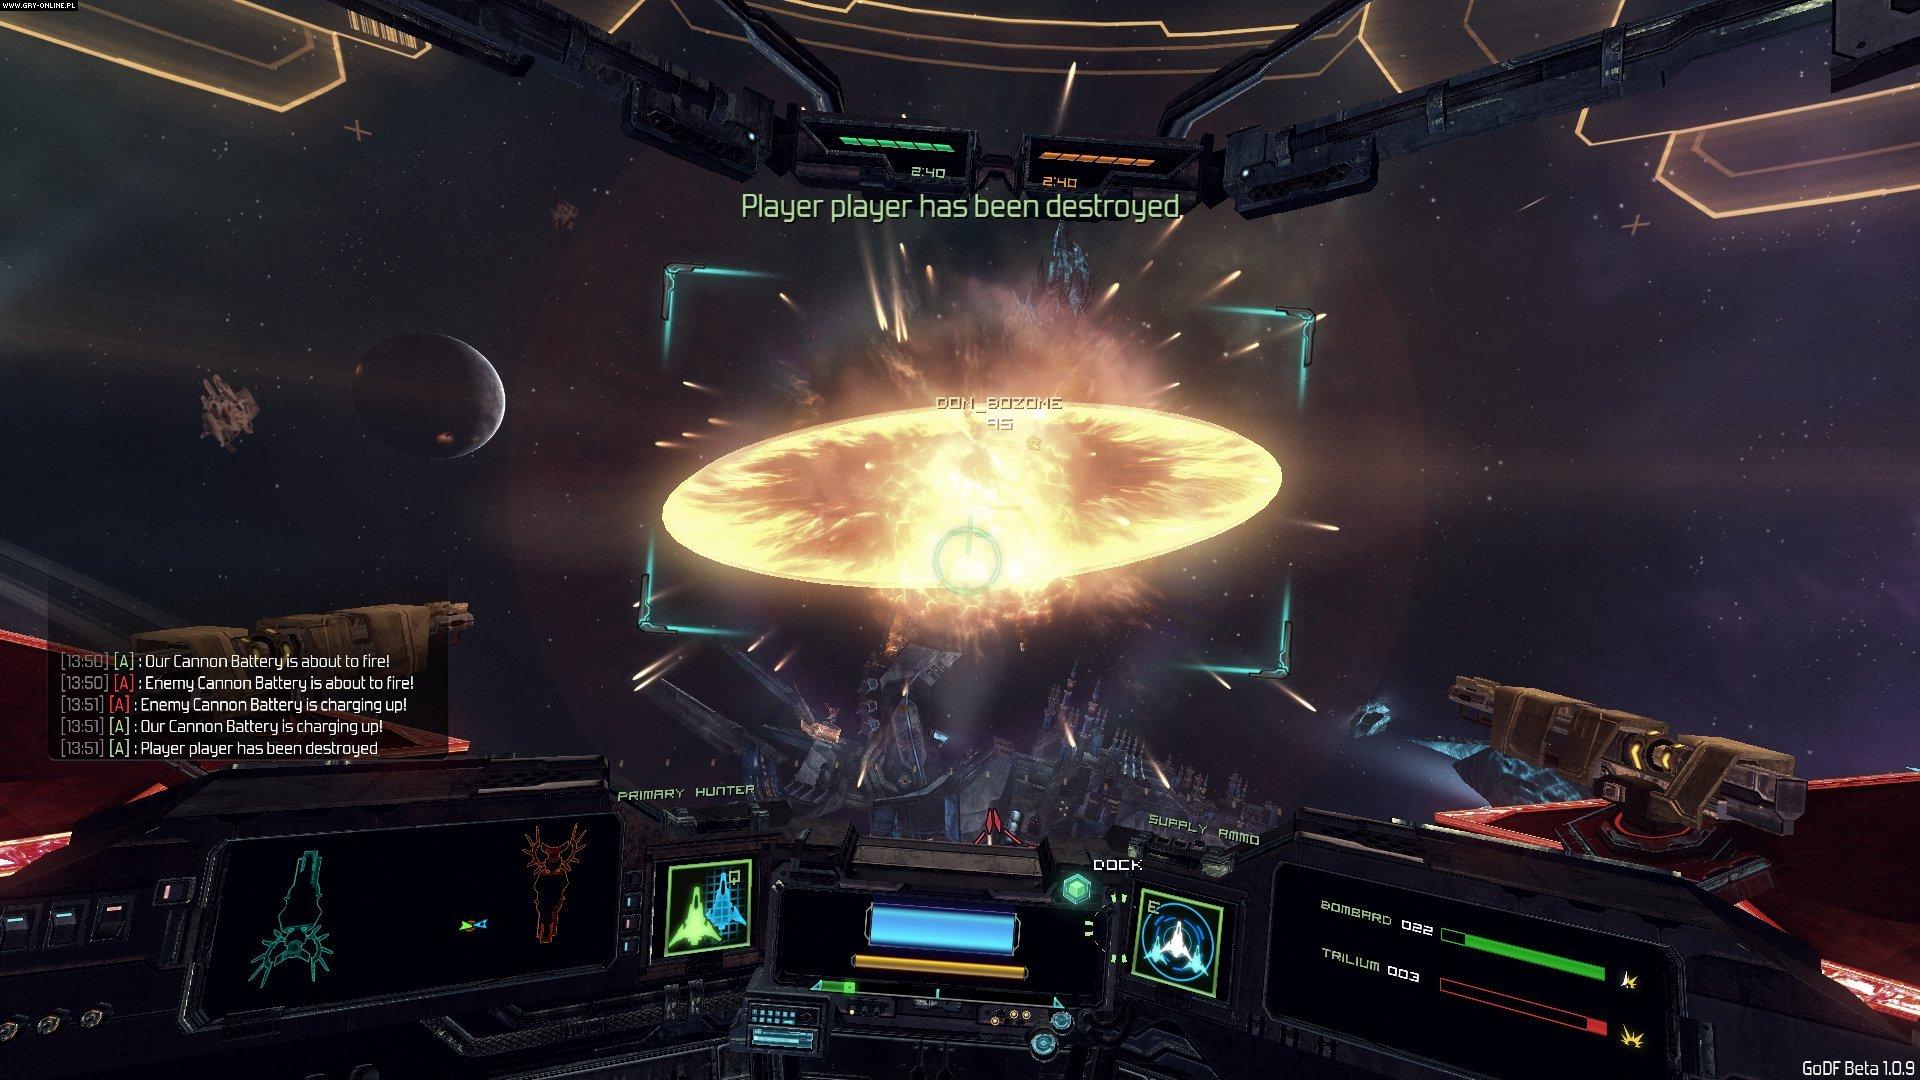 GoD Factory: Wingmen - screenshots gallery - screenshot 6/17